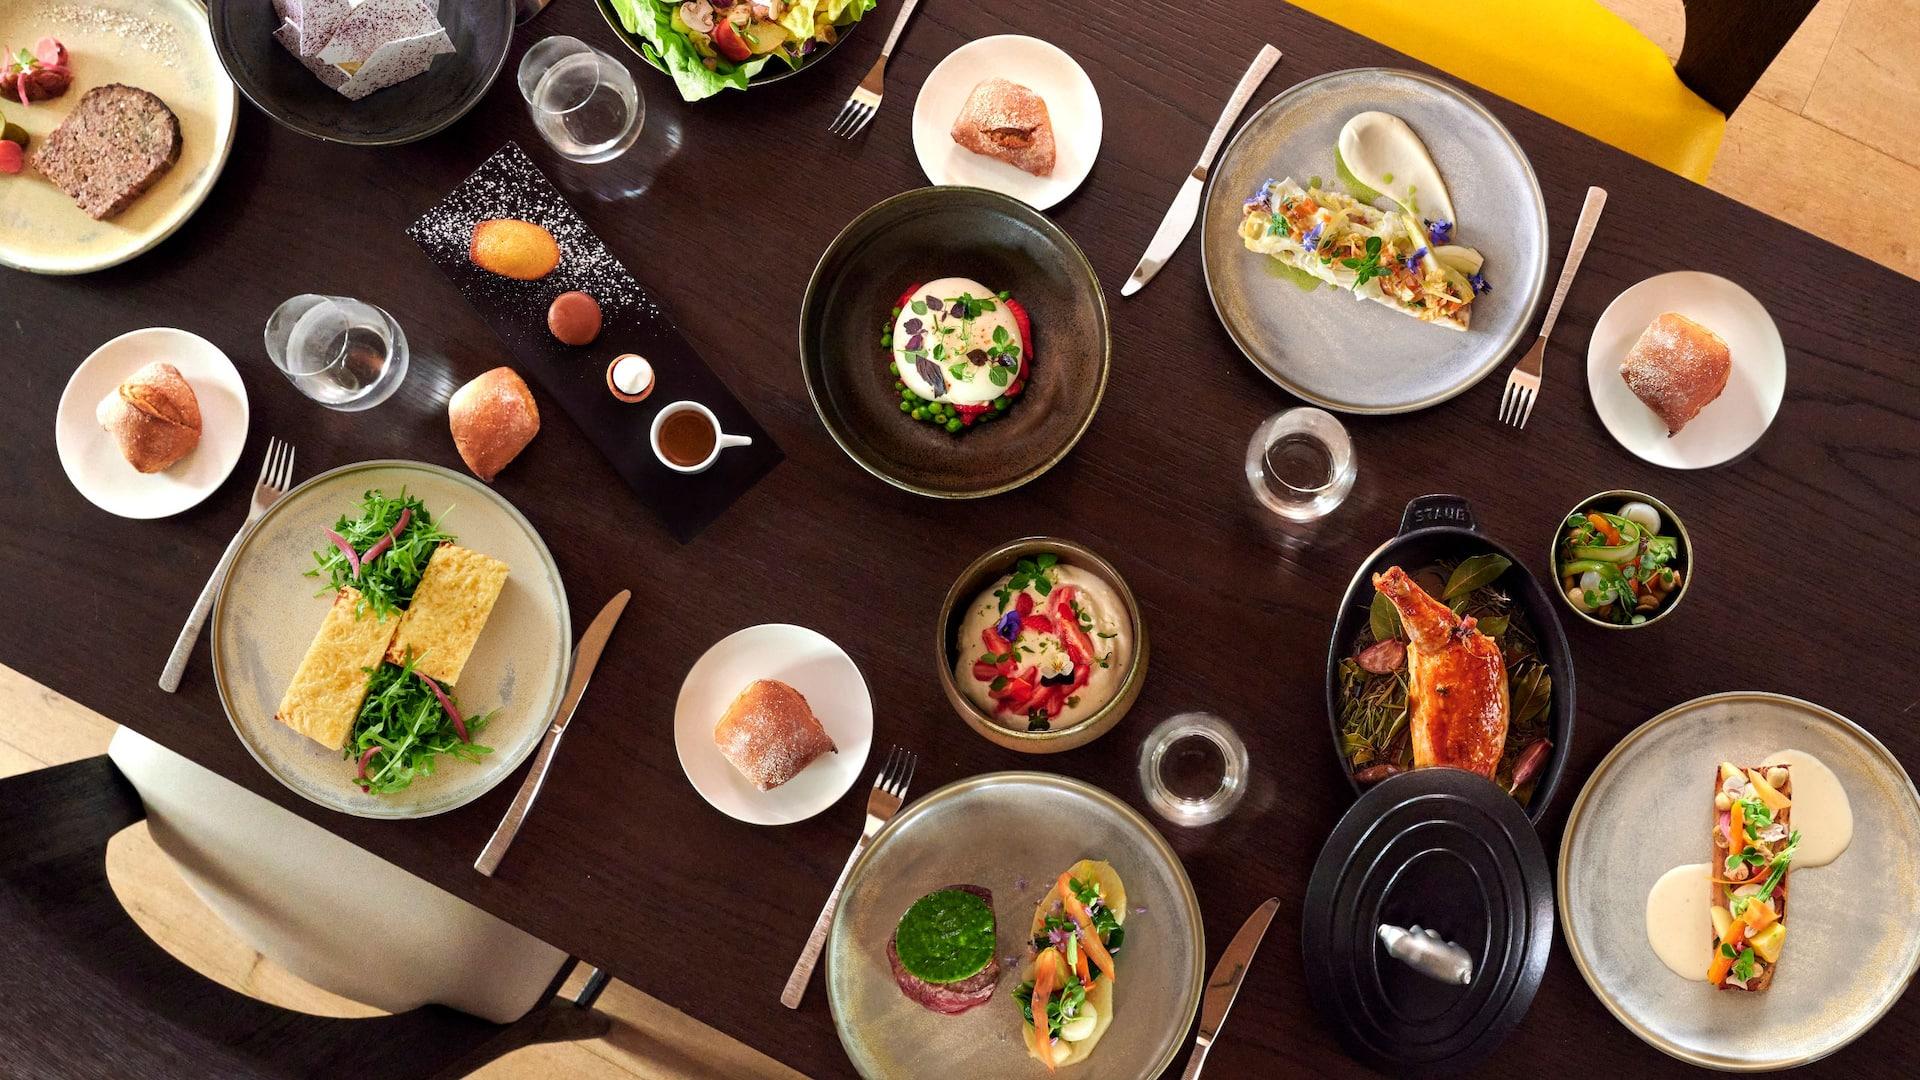 Table with gourmet food at Hyatt Paris Madeleine